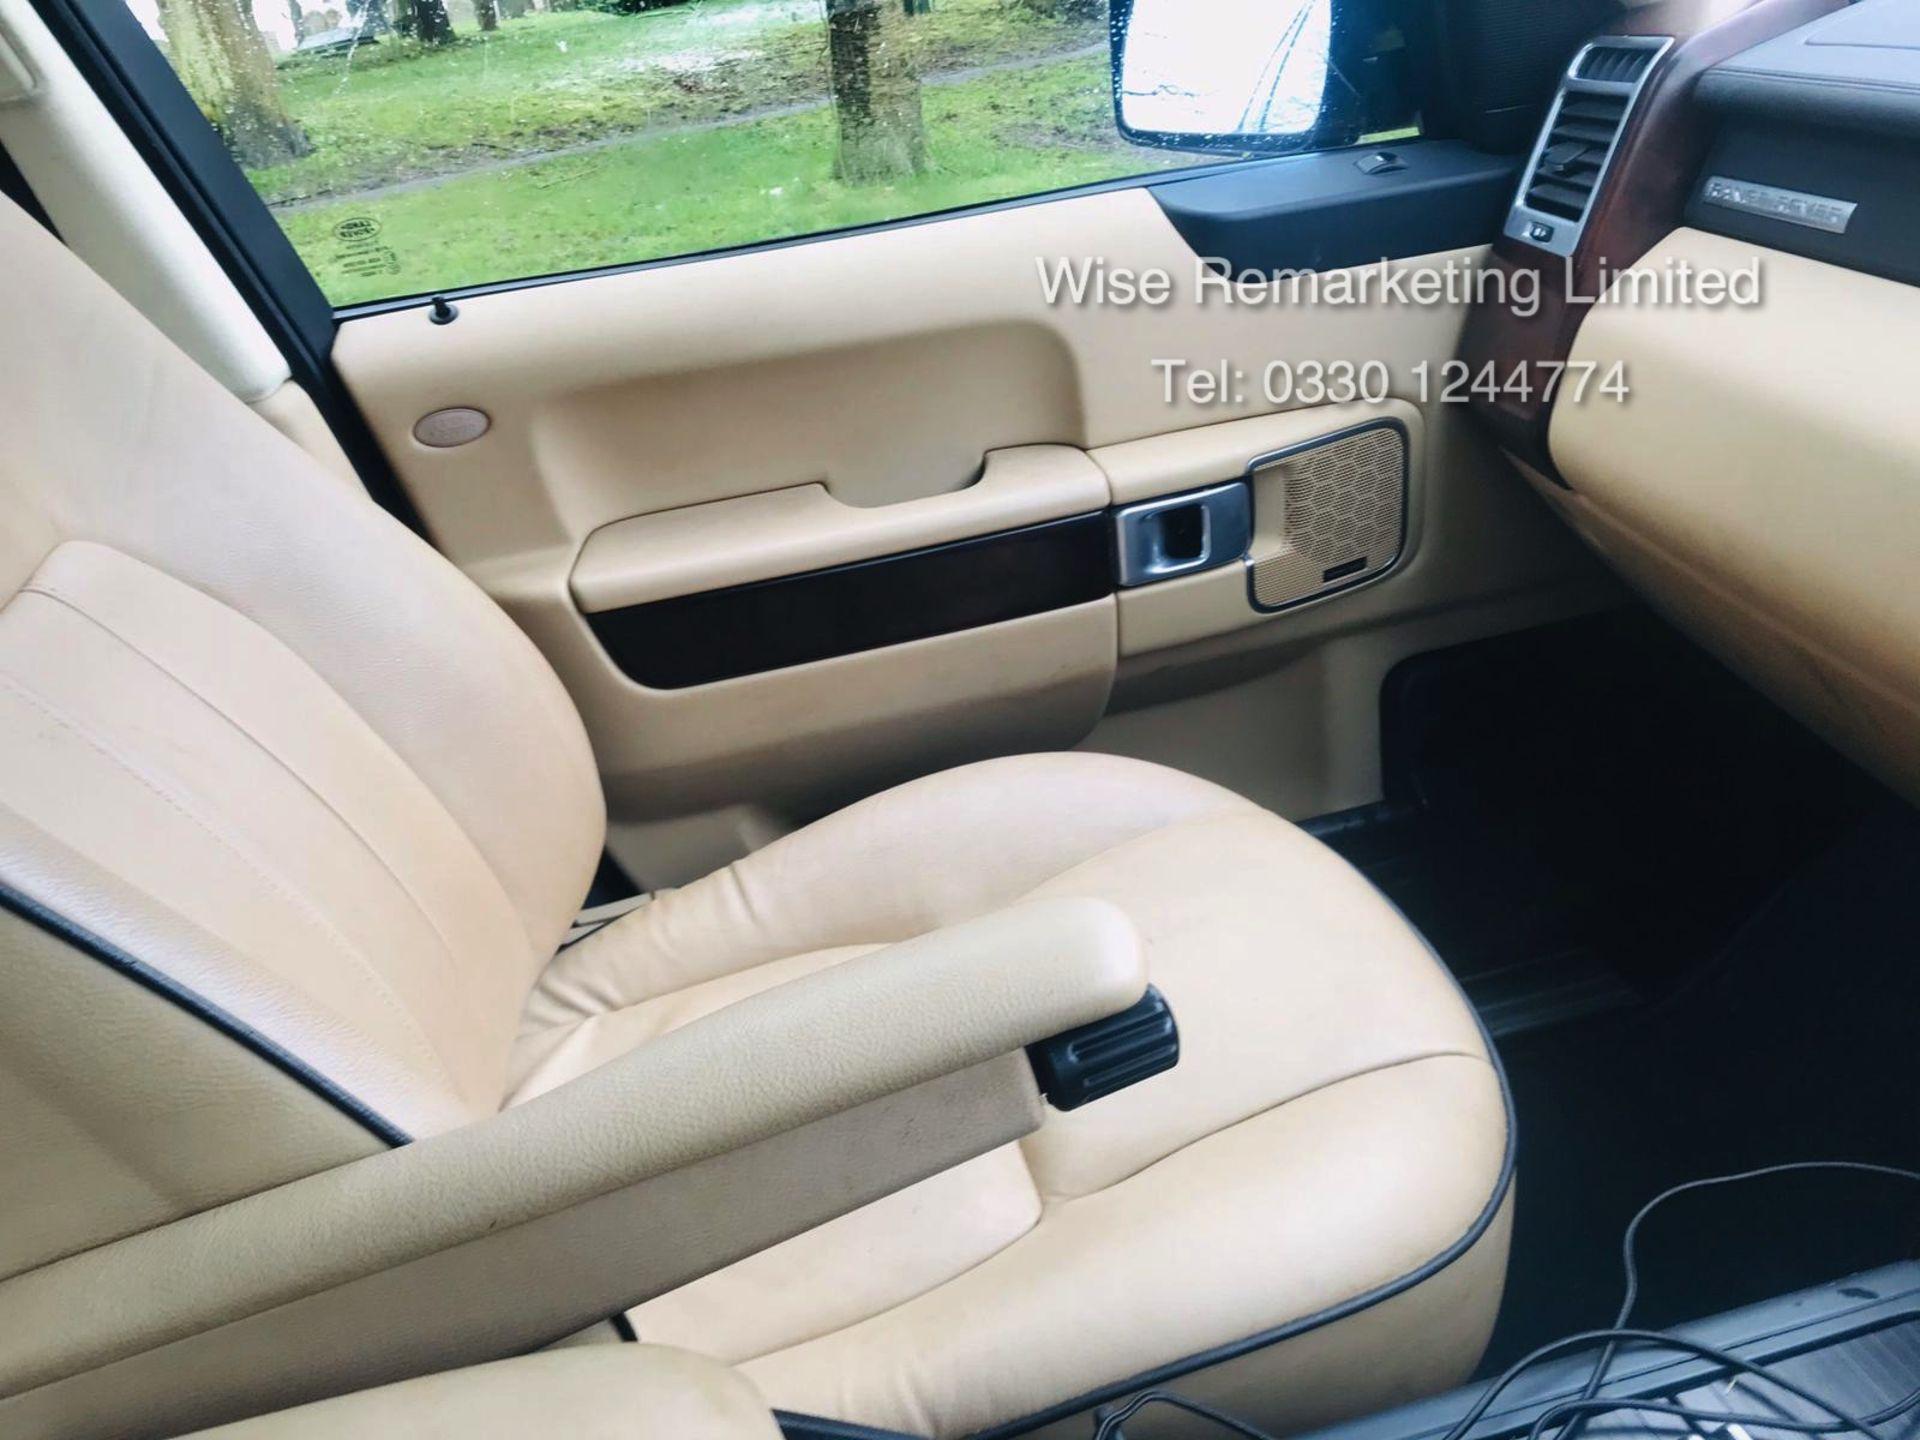 Range Rover Vogue 3.6 TDV8 HSE Auto - 2010 Model - Cream Leather - Service History - - Image 11 of 28